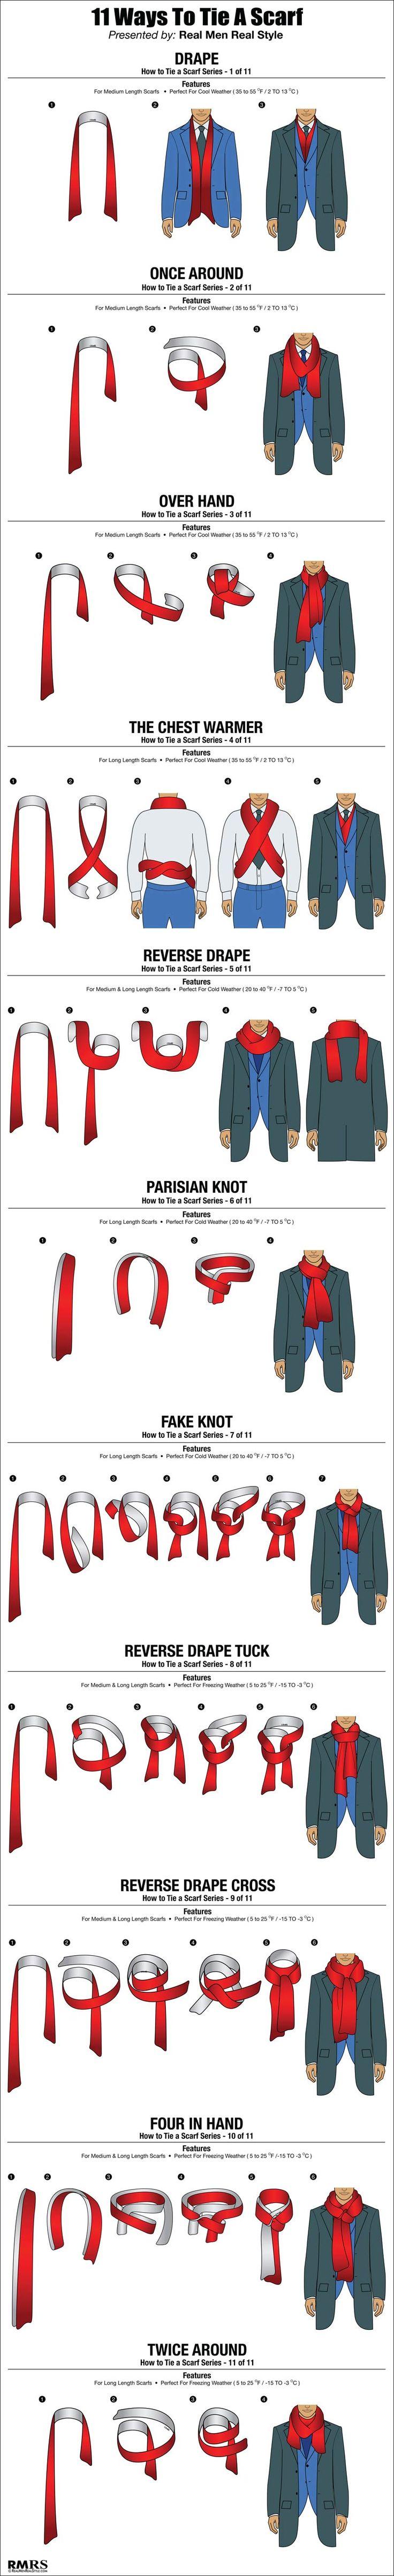 How To Tie A Scarf Chart – 11 Masculine Ways To Tie Scarves (via @Antonio Centeno)